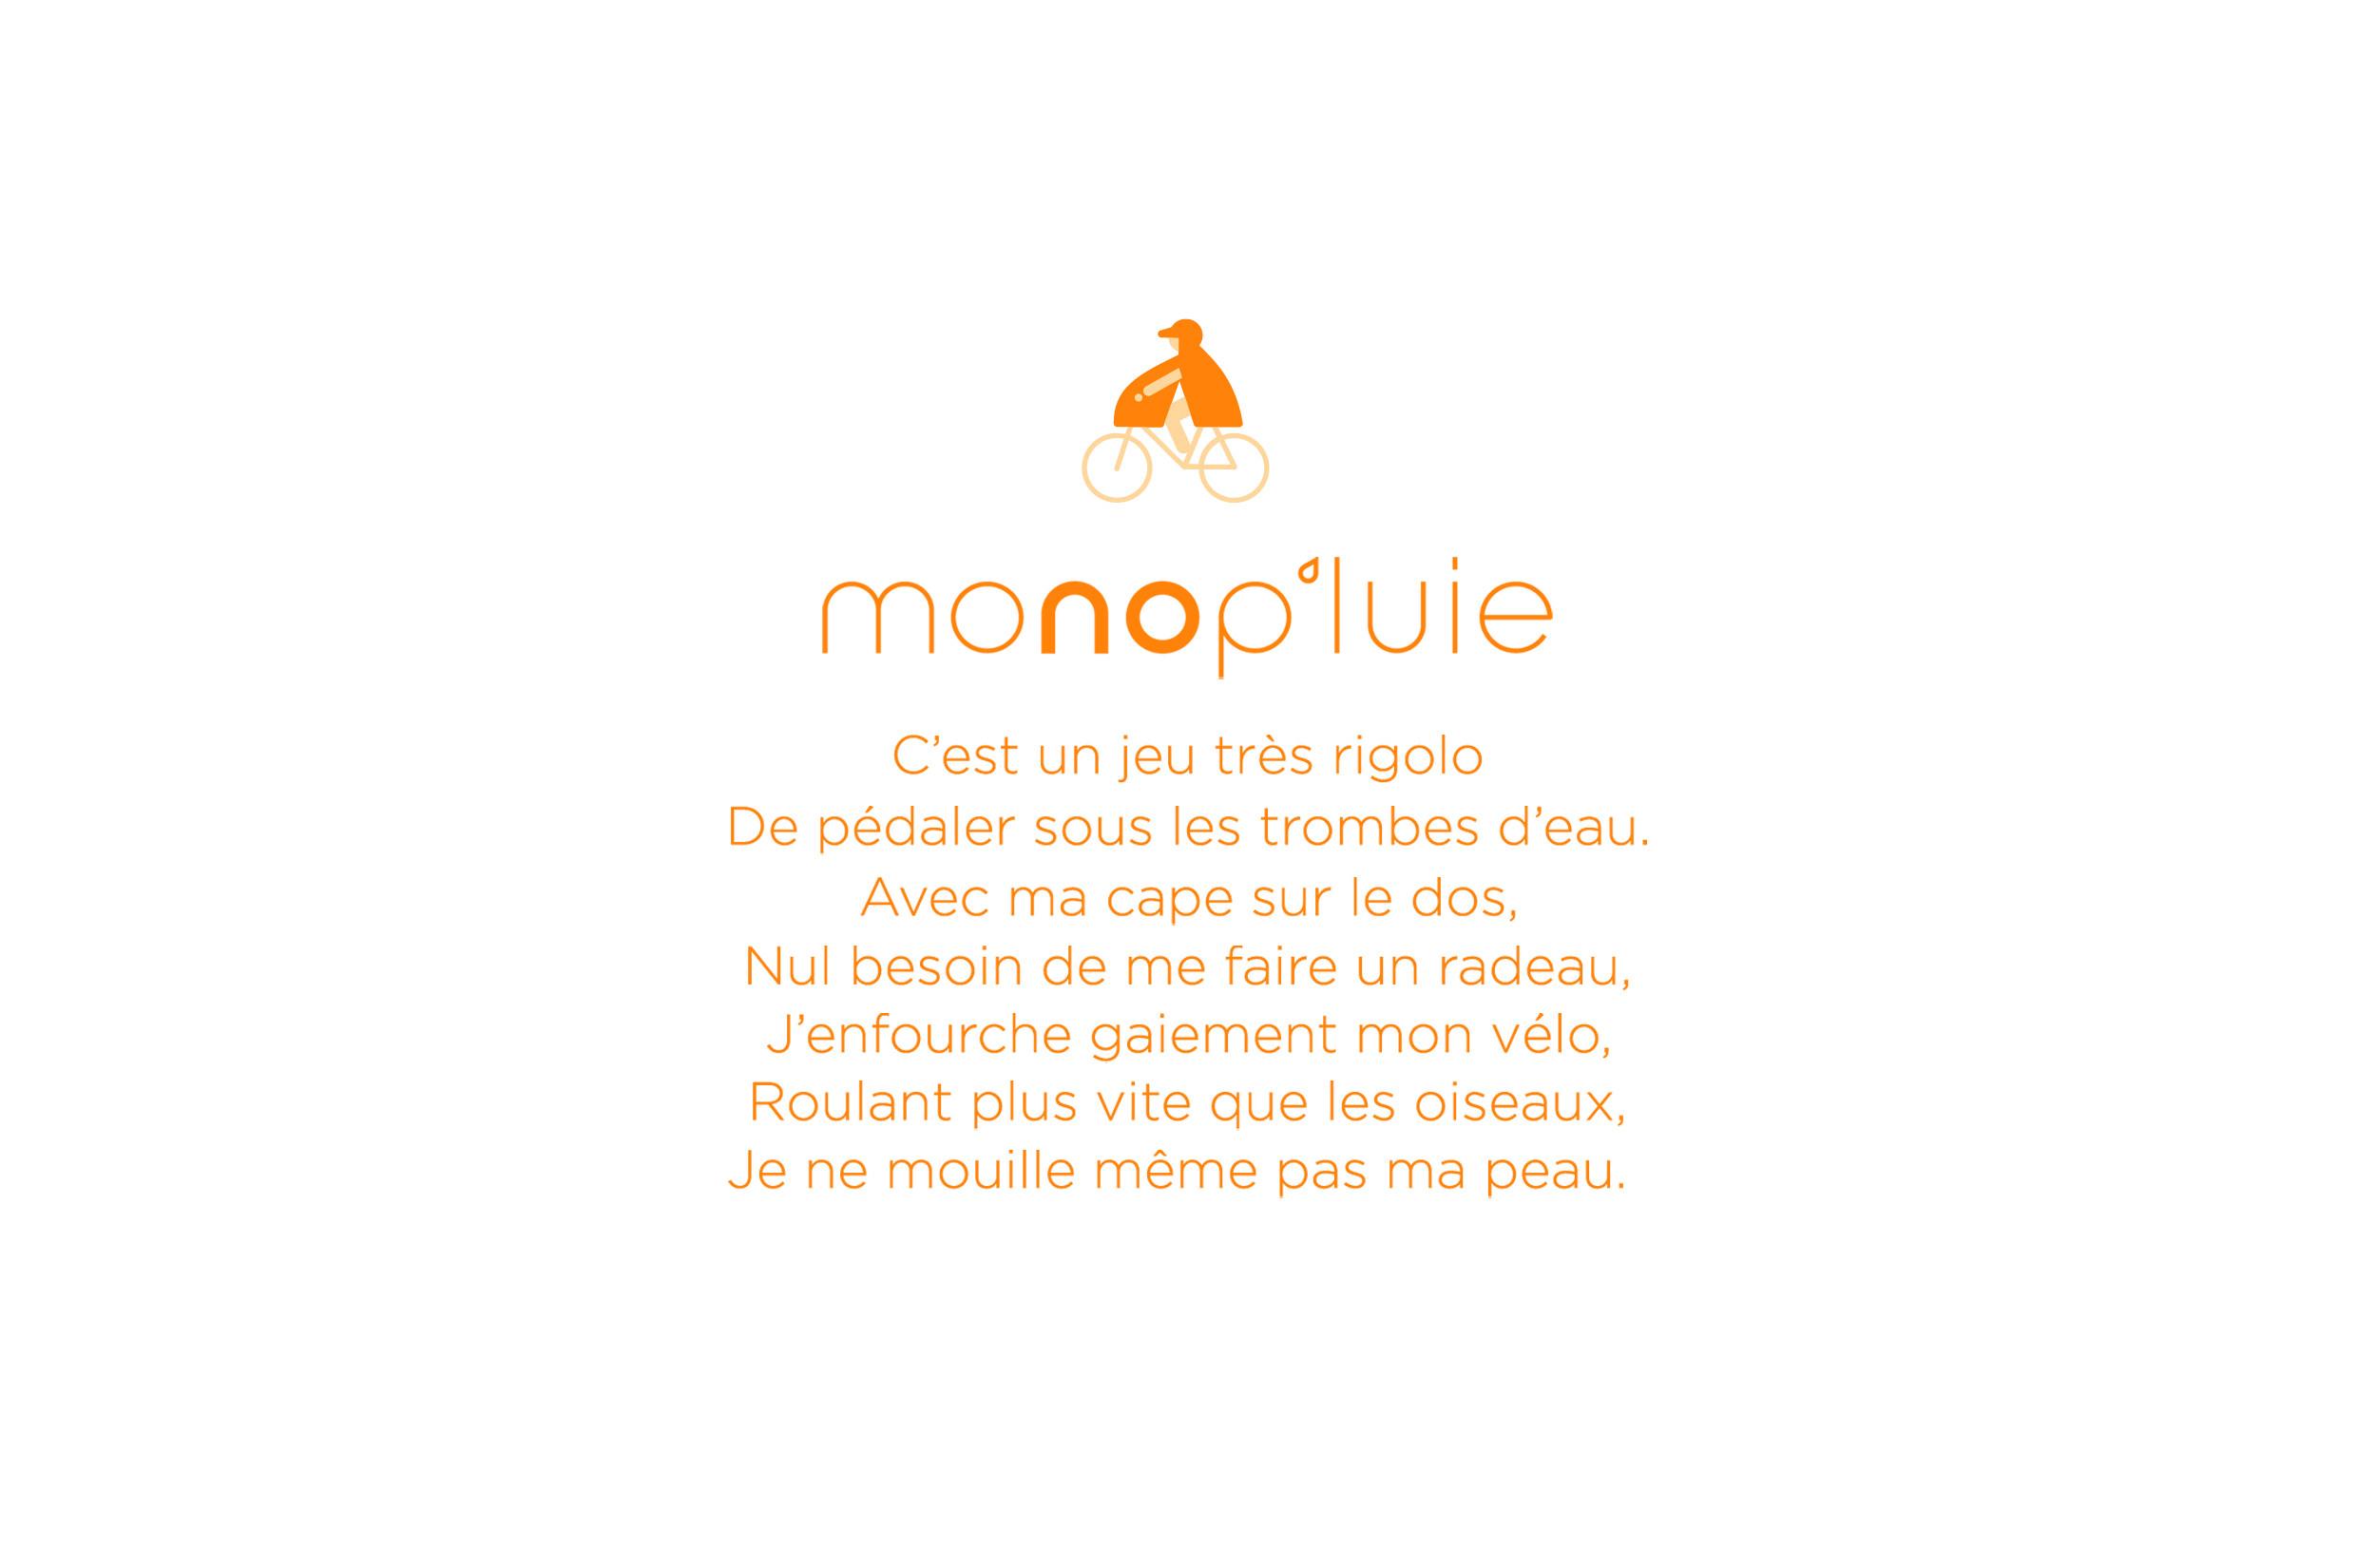 Monop'luie - 1